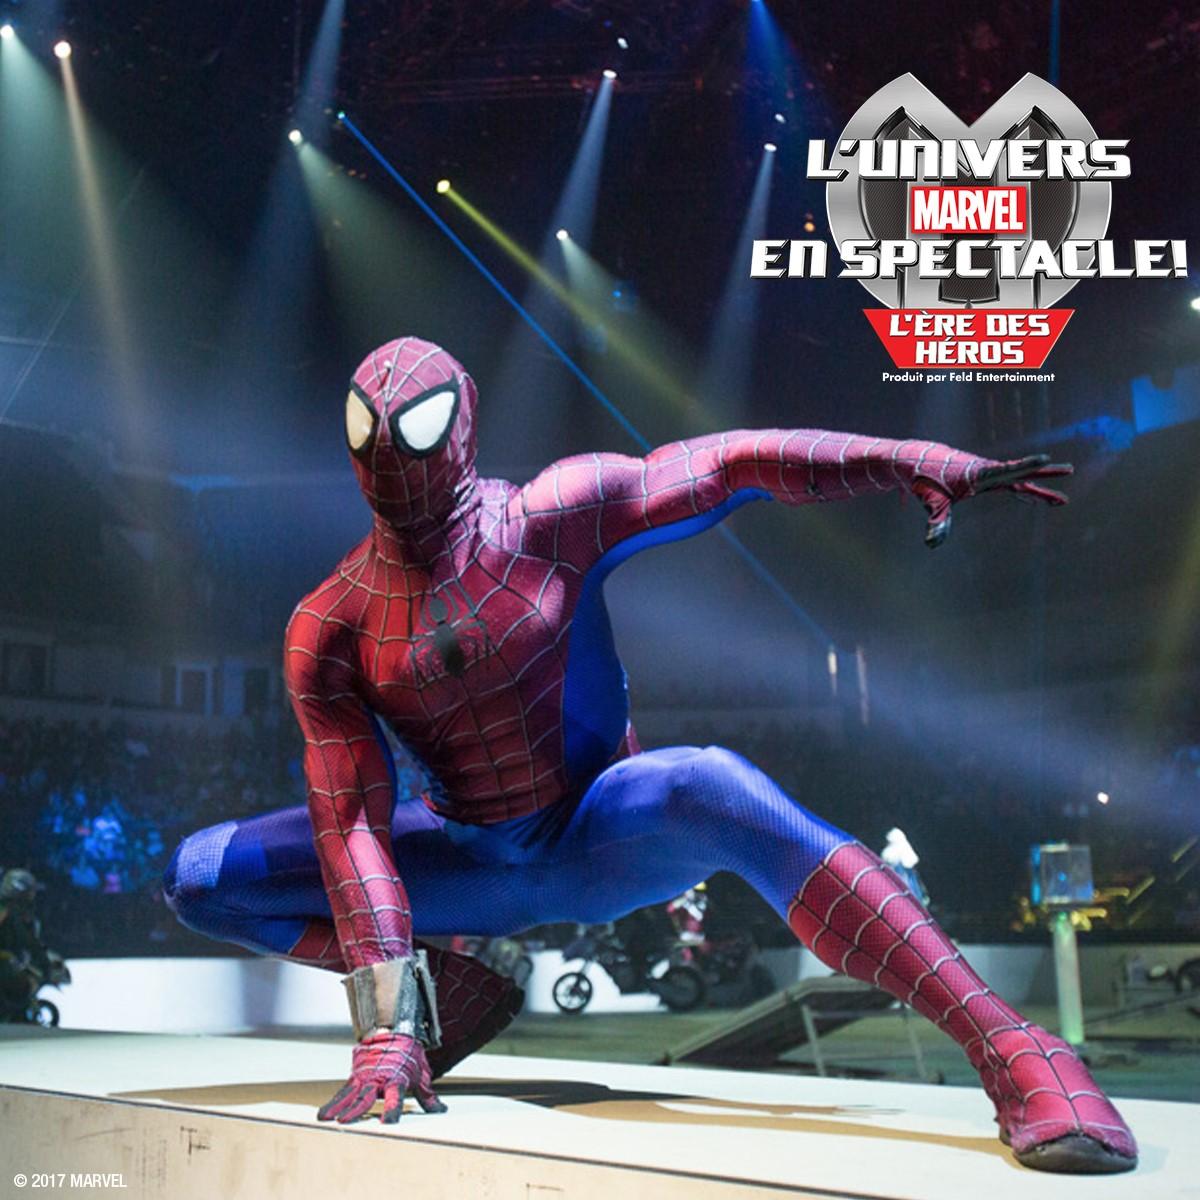 L'univers Marvel en spectacle / wooloo